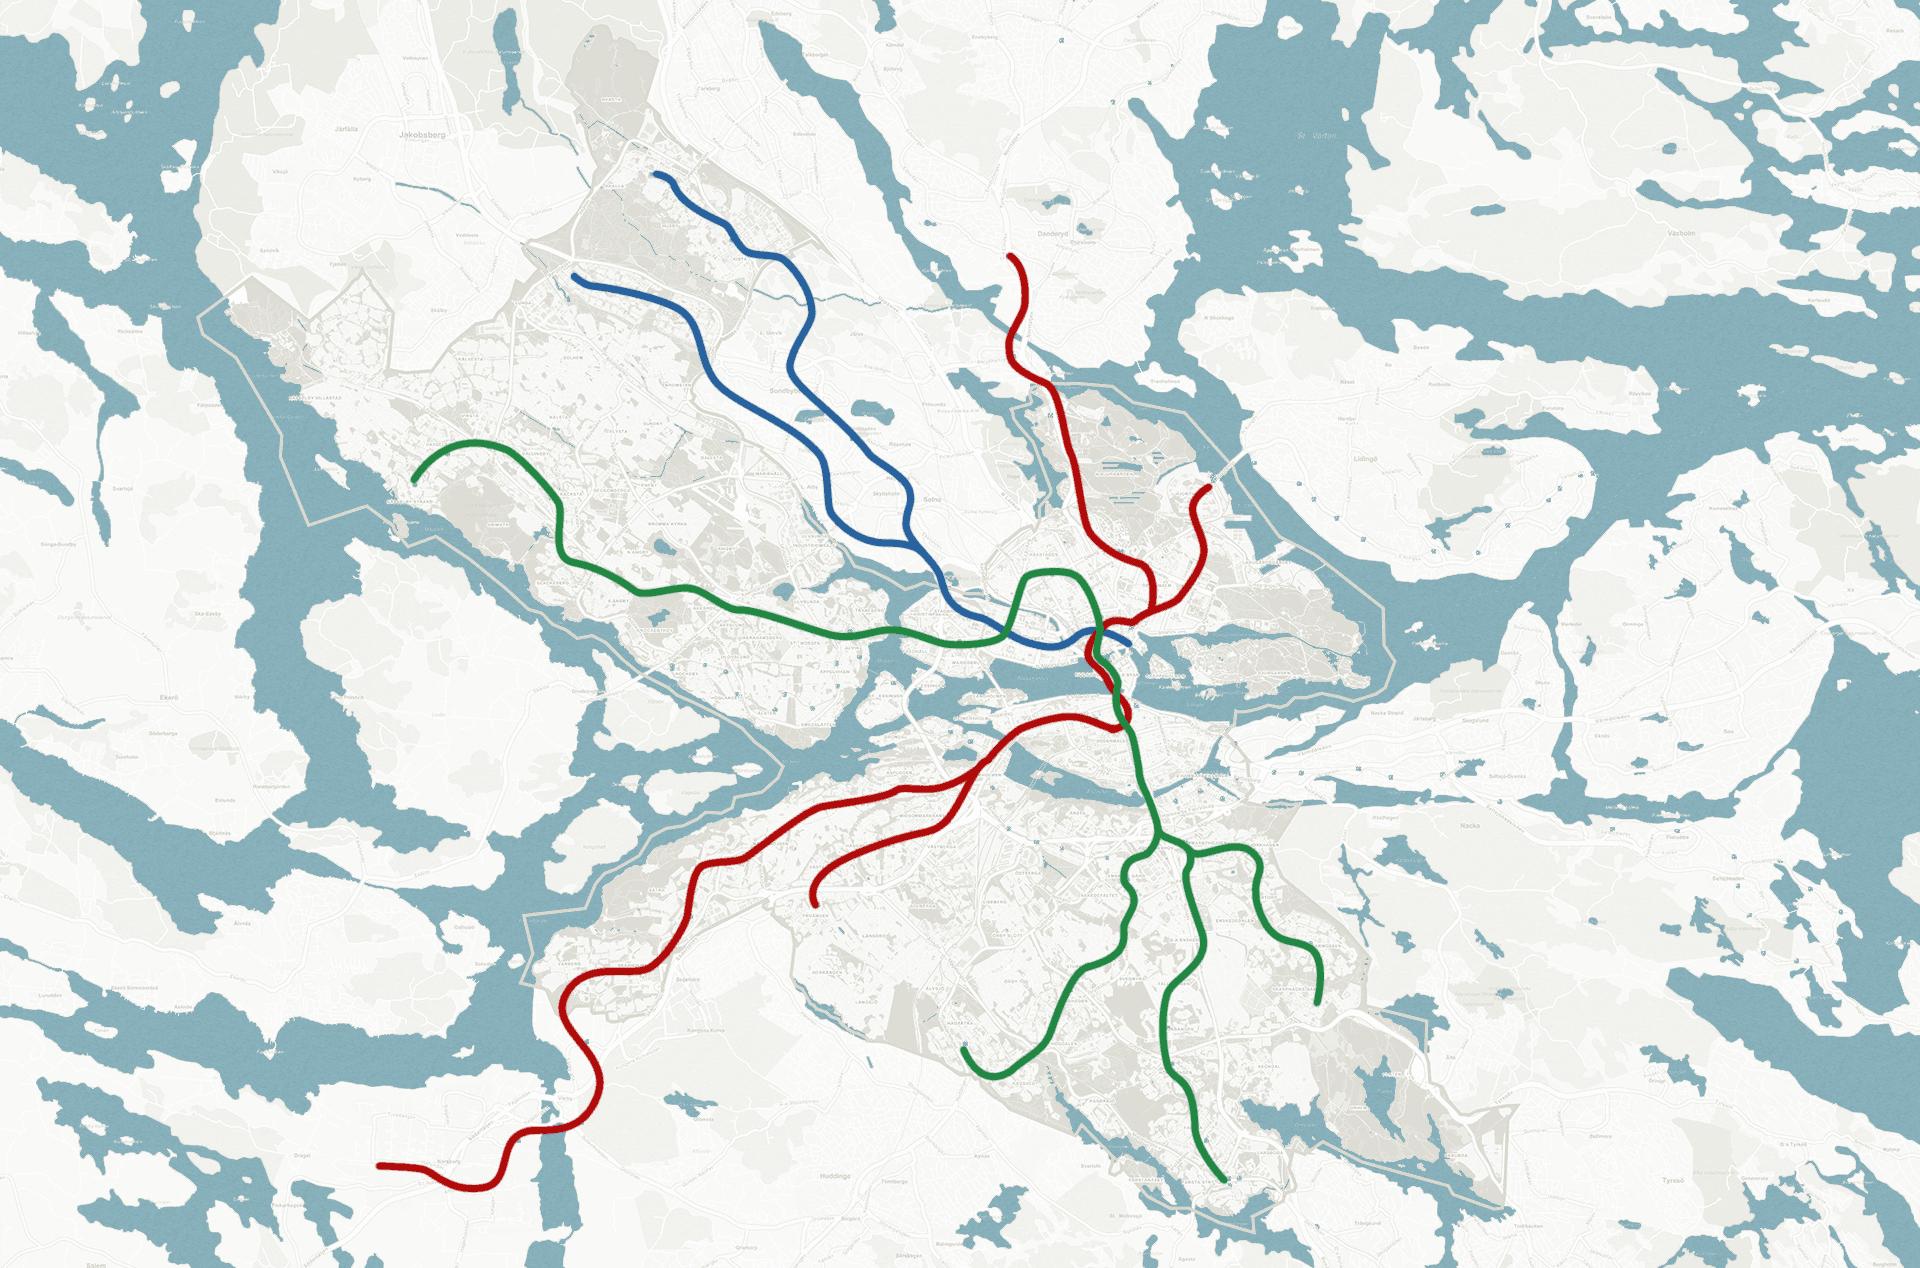 tunnelbana karta över stockholm Tunnelbanan | Stockholm 2014–2025 tunnelbana karta över stockholm